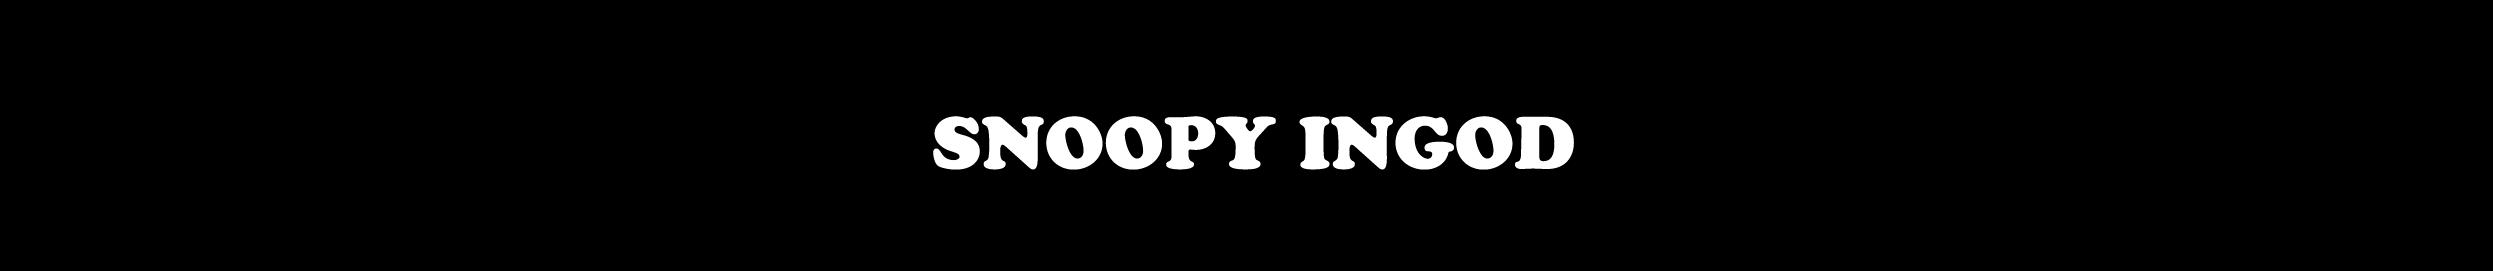 SNOOPY INGOD